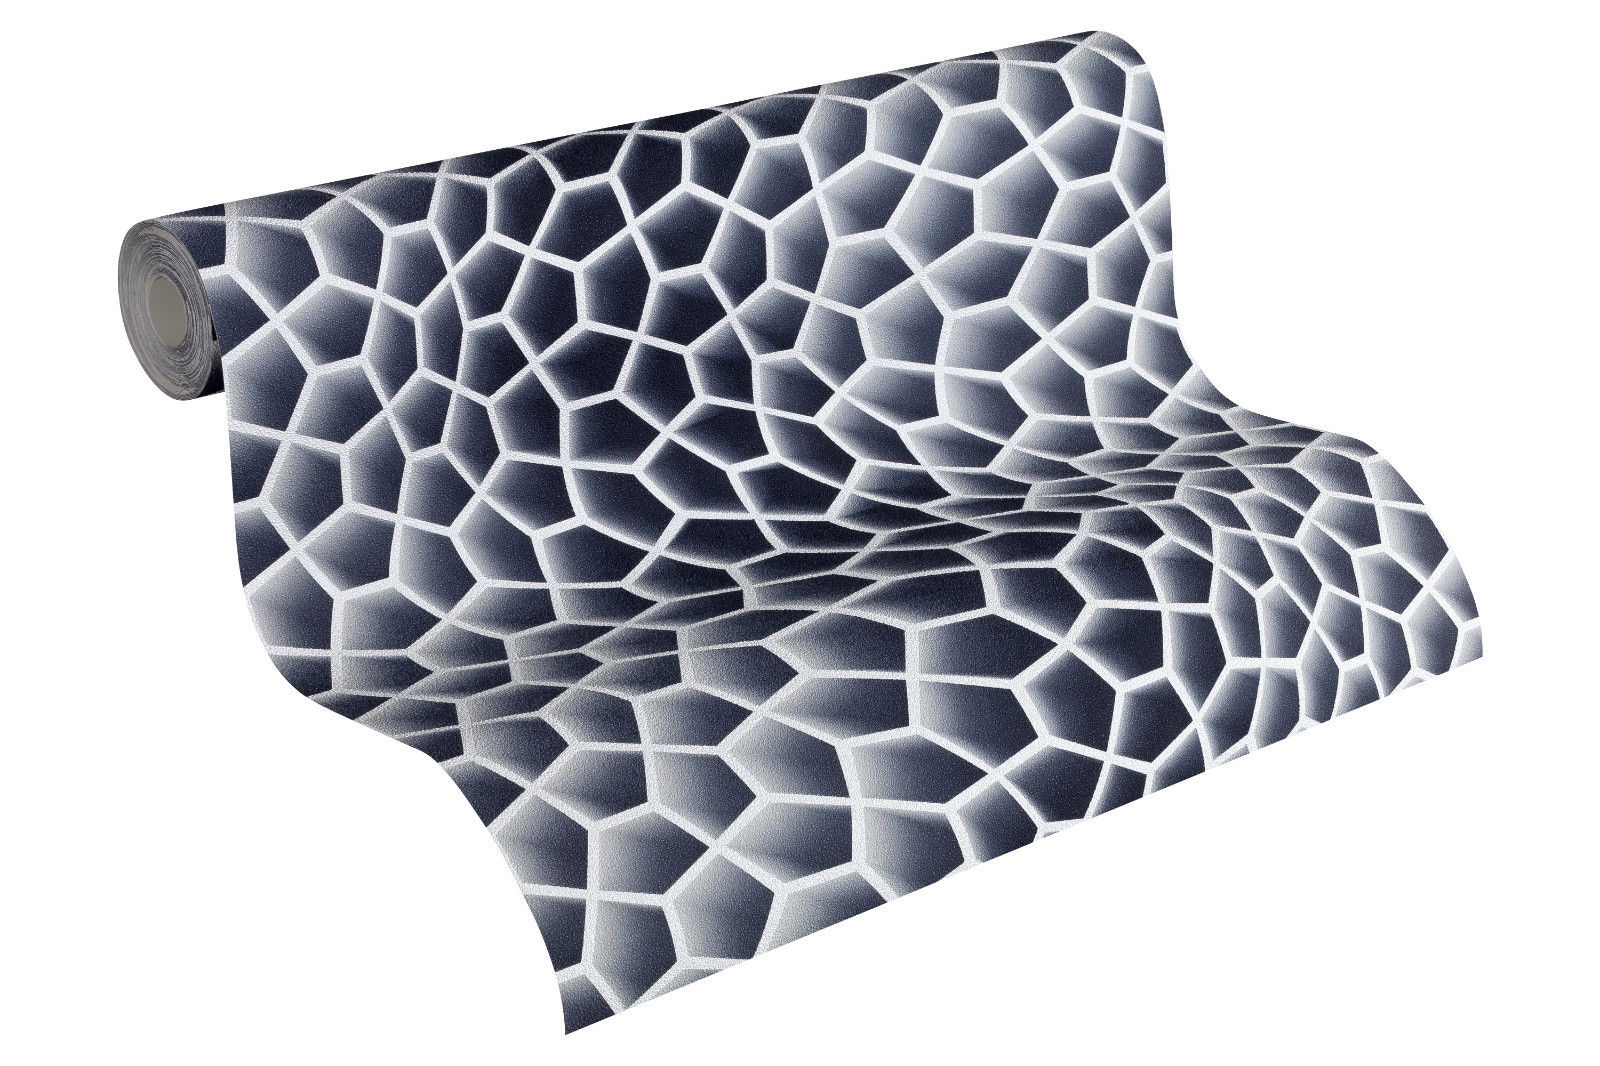 vliestapete retro 3d wellen muster grau waben design by mac stopa 32709 4 kaufen bei joratrend. Black Bedroom Furniture Sets. Home Design Ideas